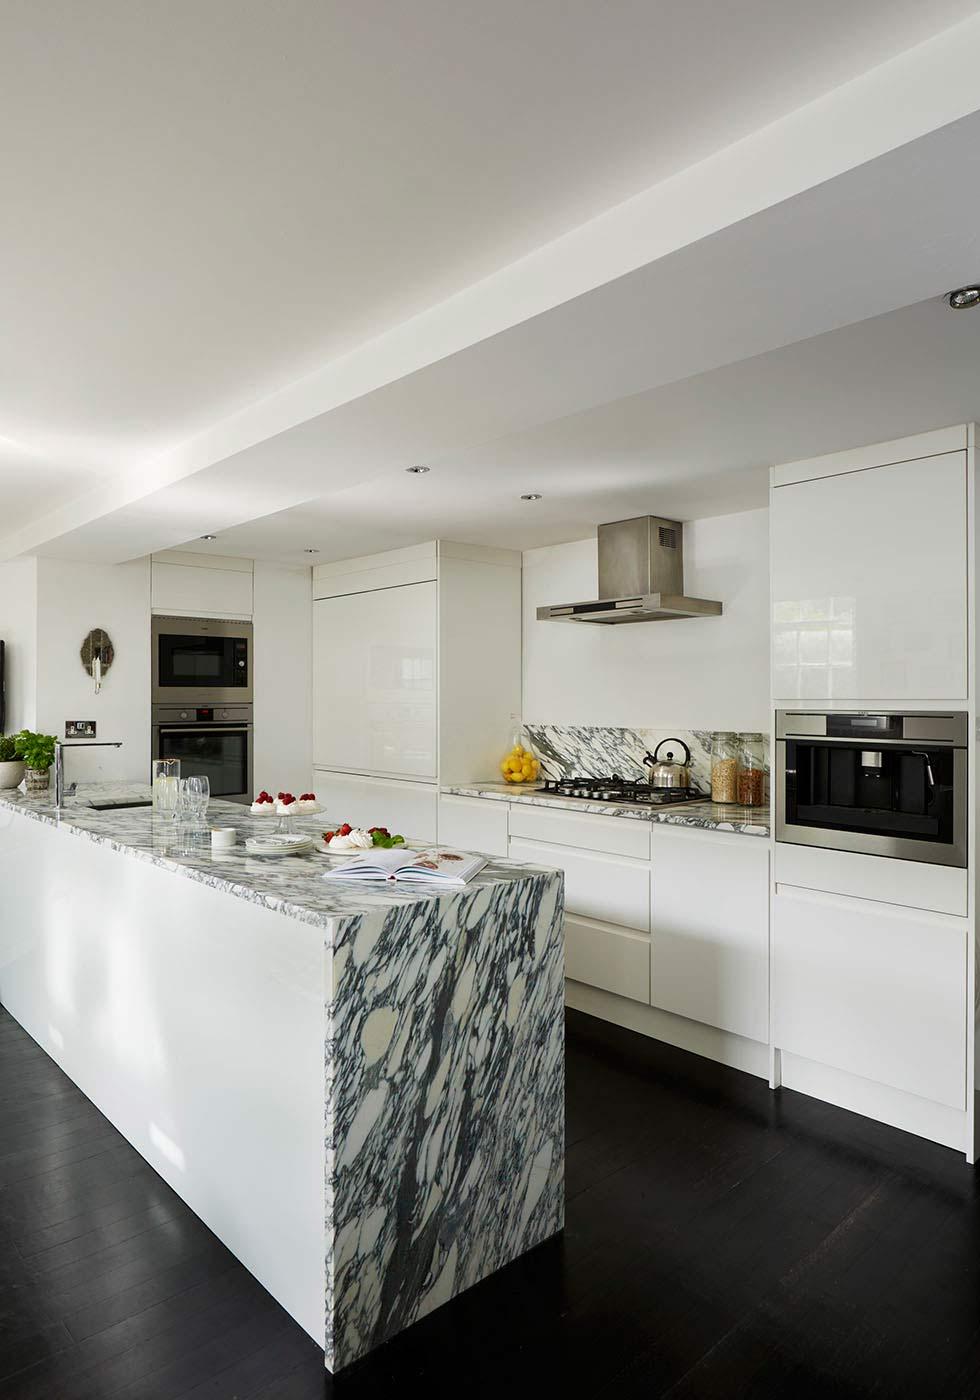 luxury contemporary kitchen under a mezzanine in a school conversion